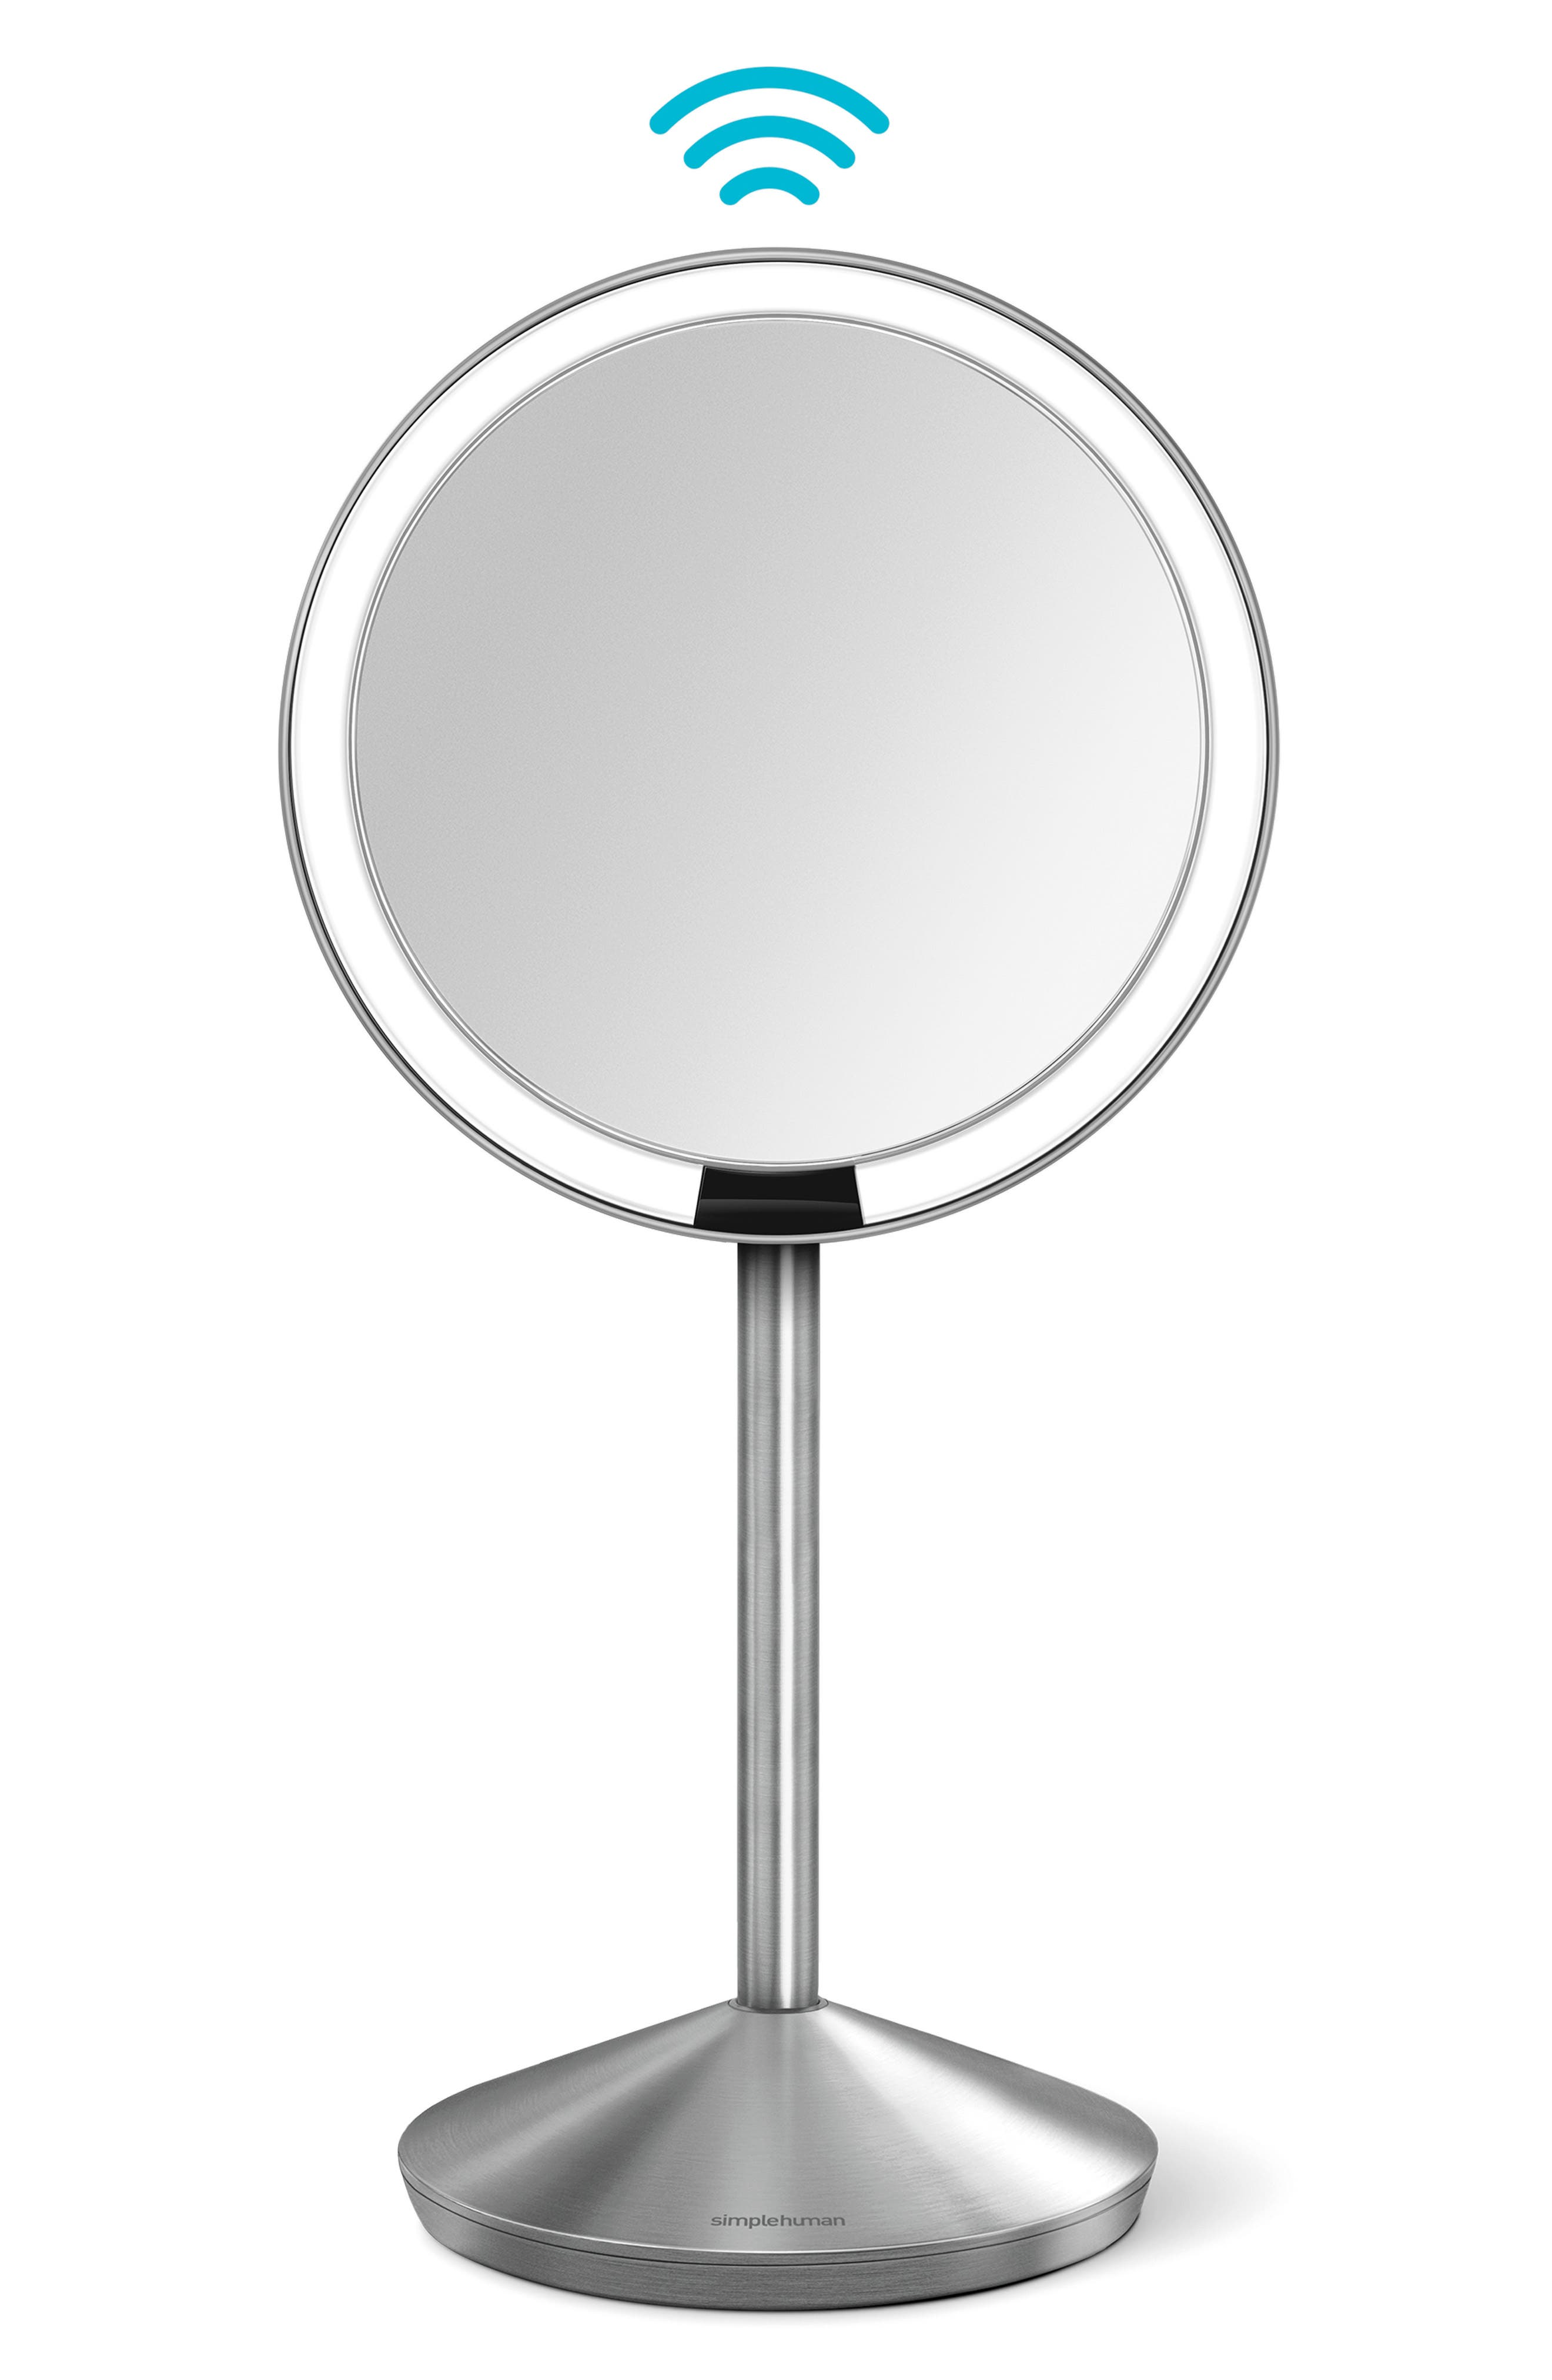 5-Inch Mini Countertop Sensor Makeup Mirror | Nordstrom